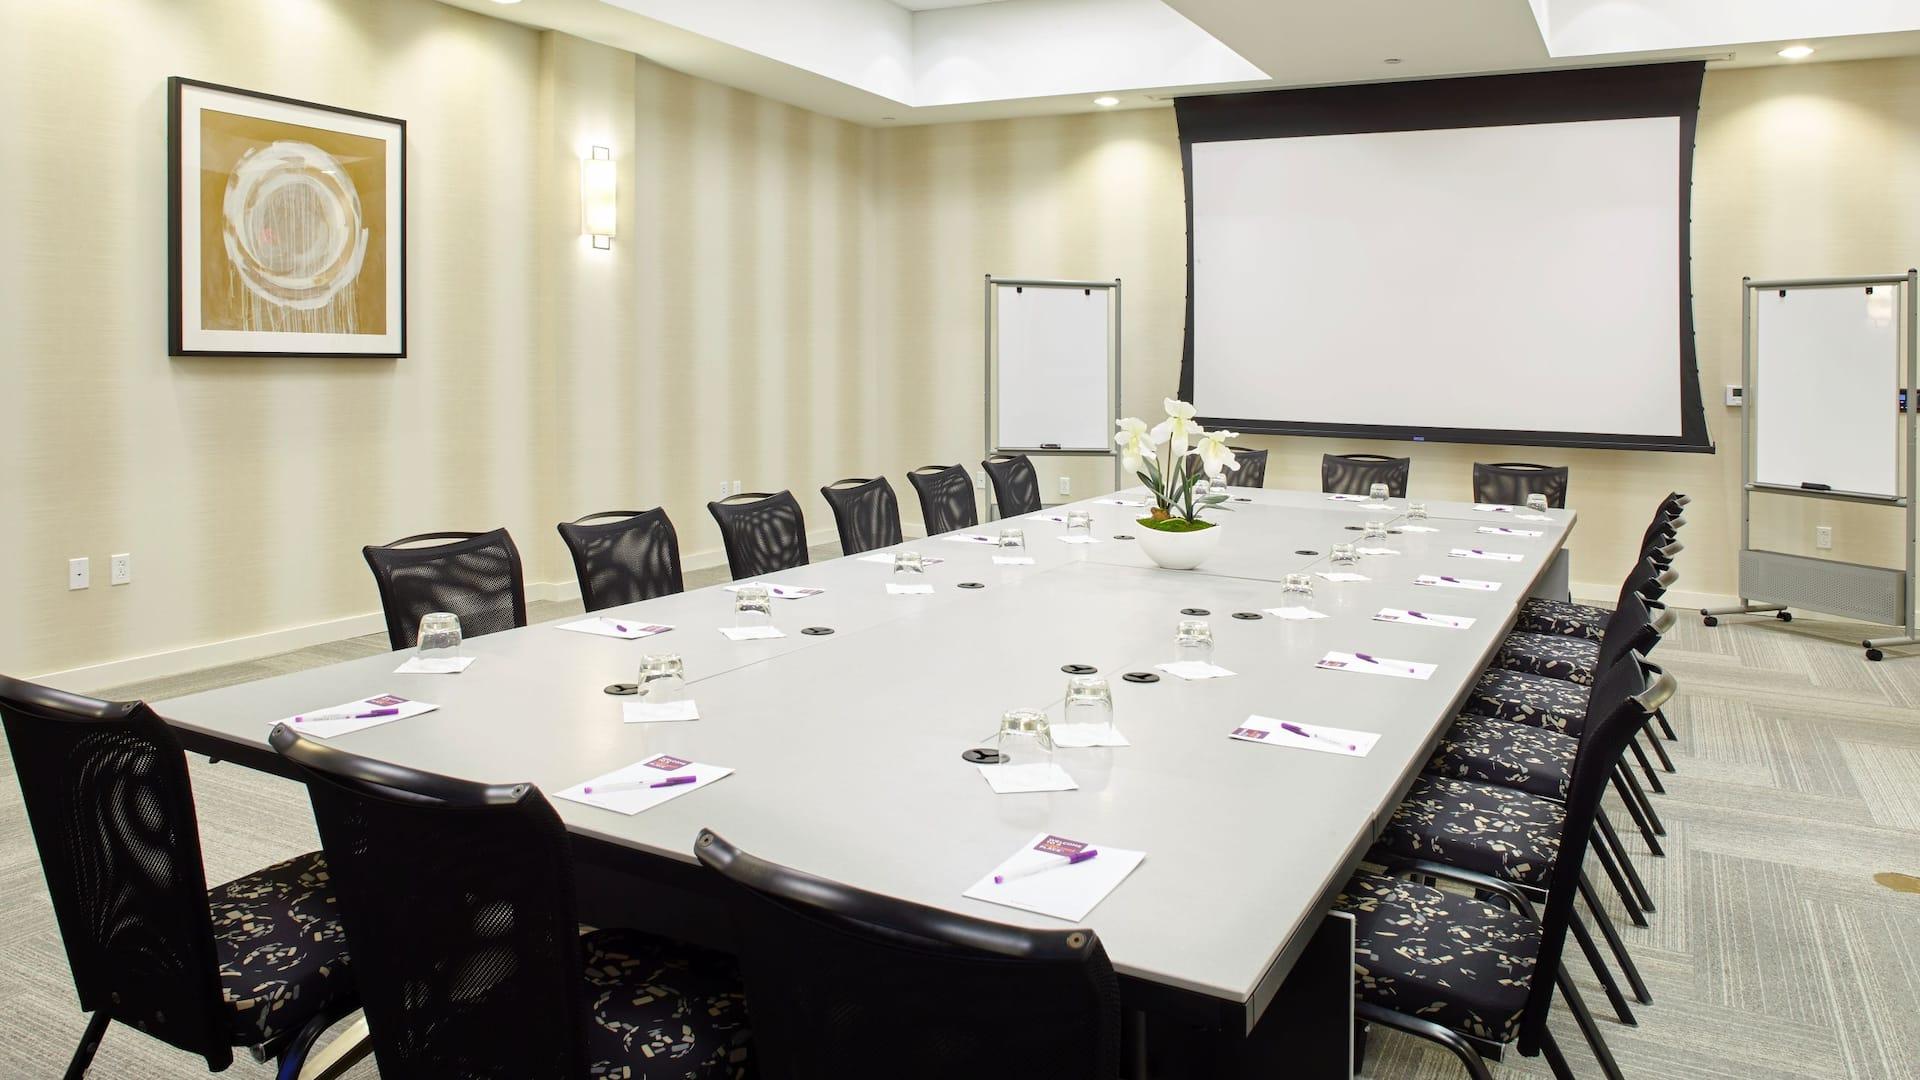 Meeting room in Miami Springs,Fl at Hyatt Place Miami Airport-East